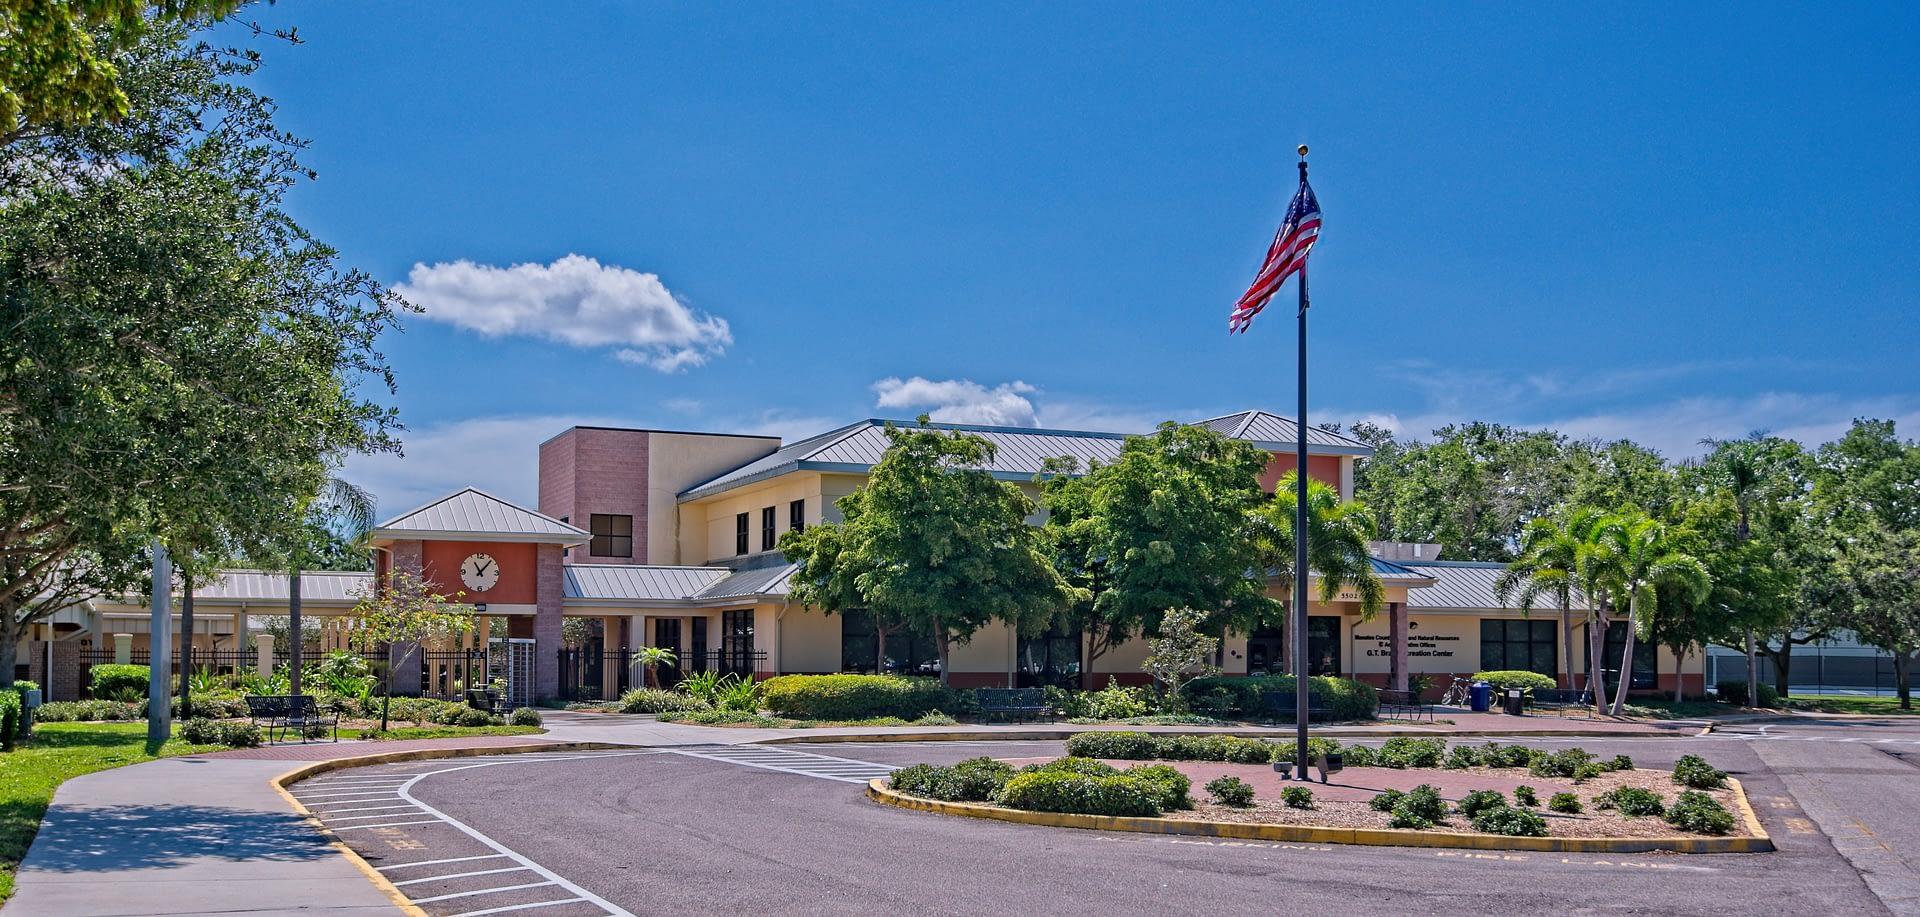 GT Bray Rec Center 5502 33rd Ave Dr W, Bradenton, FL 34209